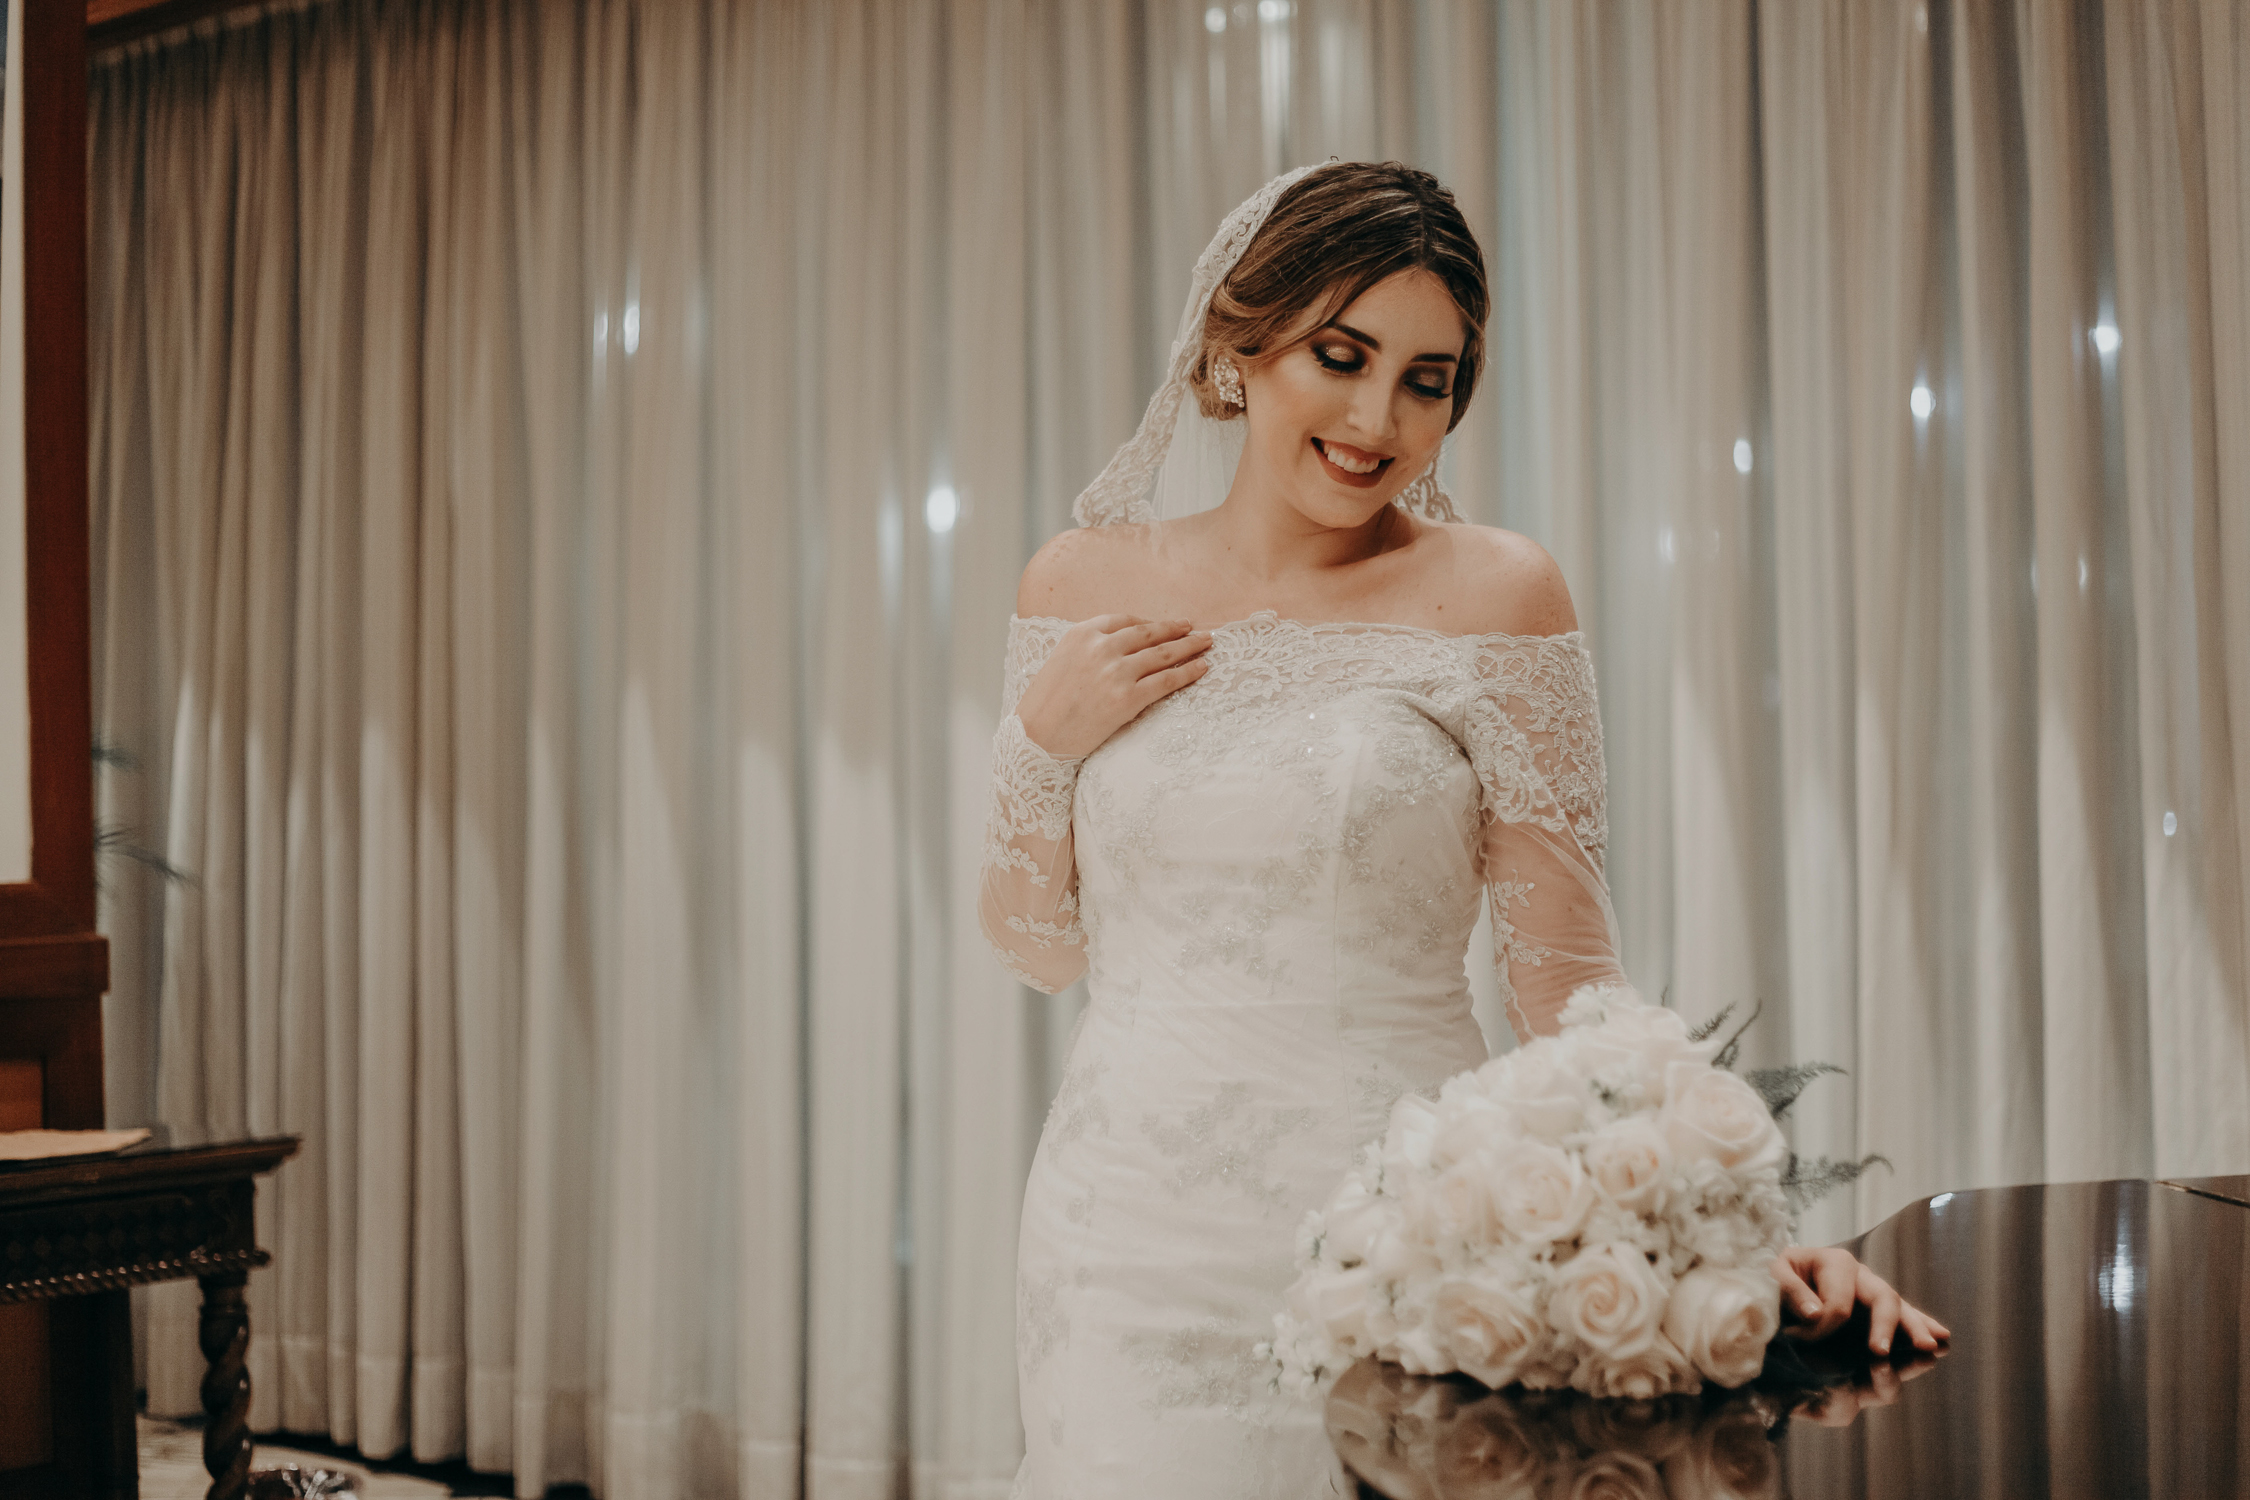 Michelle-Agurto-Fotografia-Bodas-Ecuador-Destination-Wedding-Photographer-Vicky-Javier-24.JPG